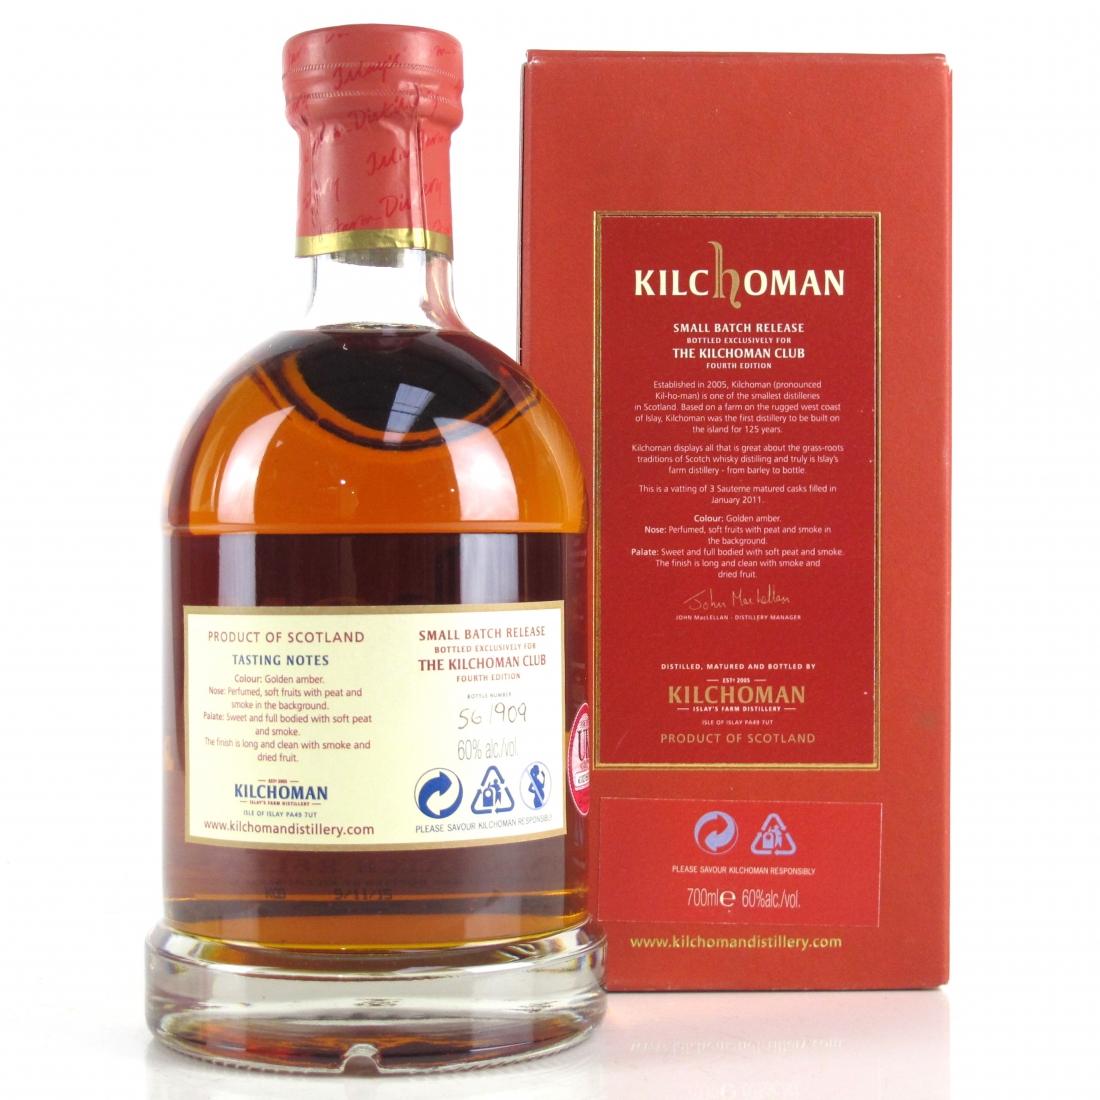 Kilchoman 2011 Small Batch / Kilchoman Club 4th Edition